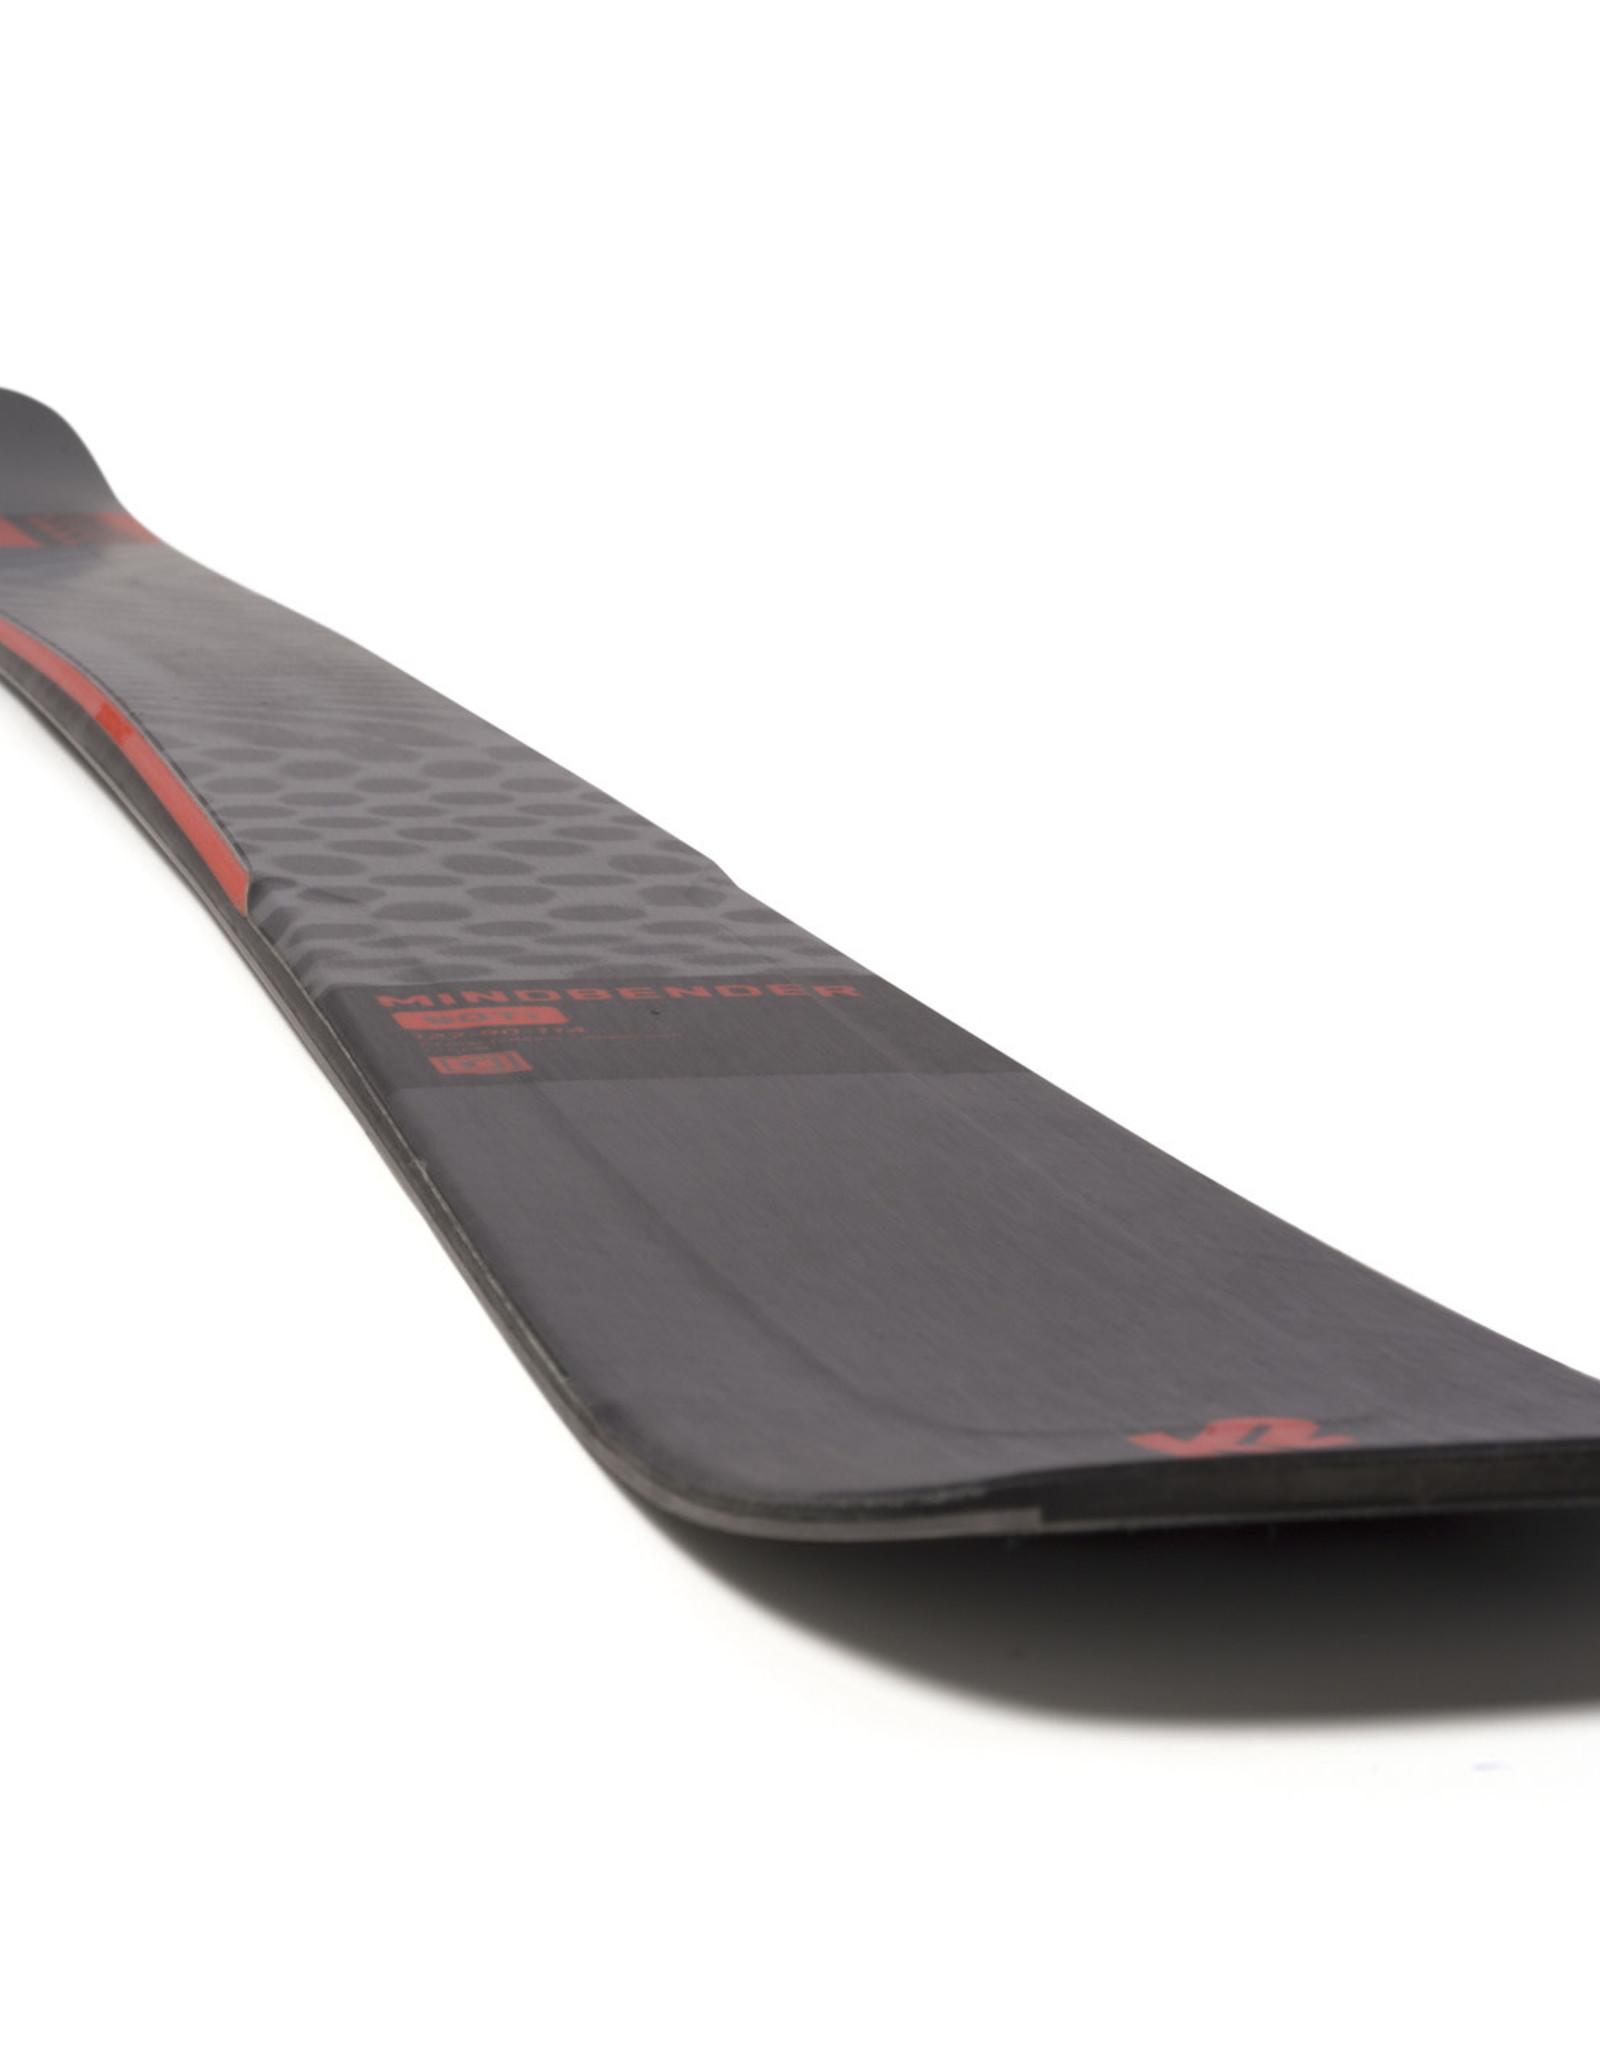 K2 K2 Skis MINDBENDER 90 Ti (21/22)